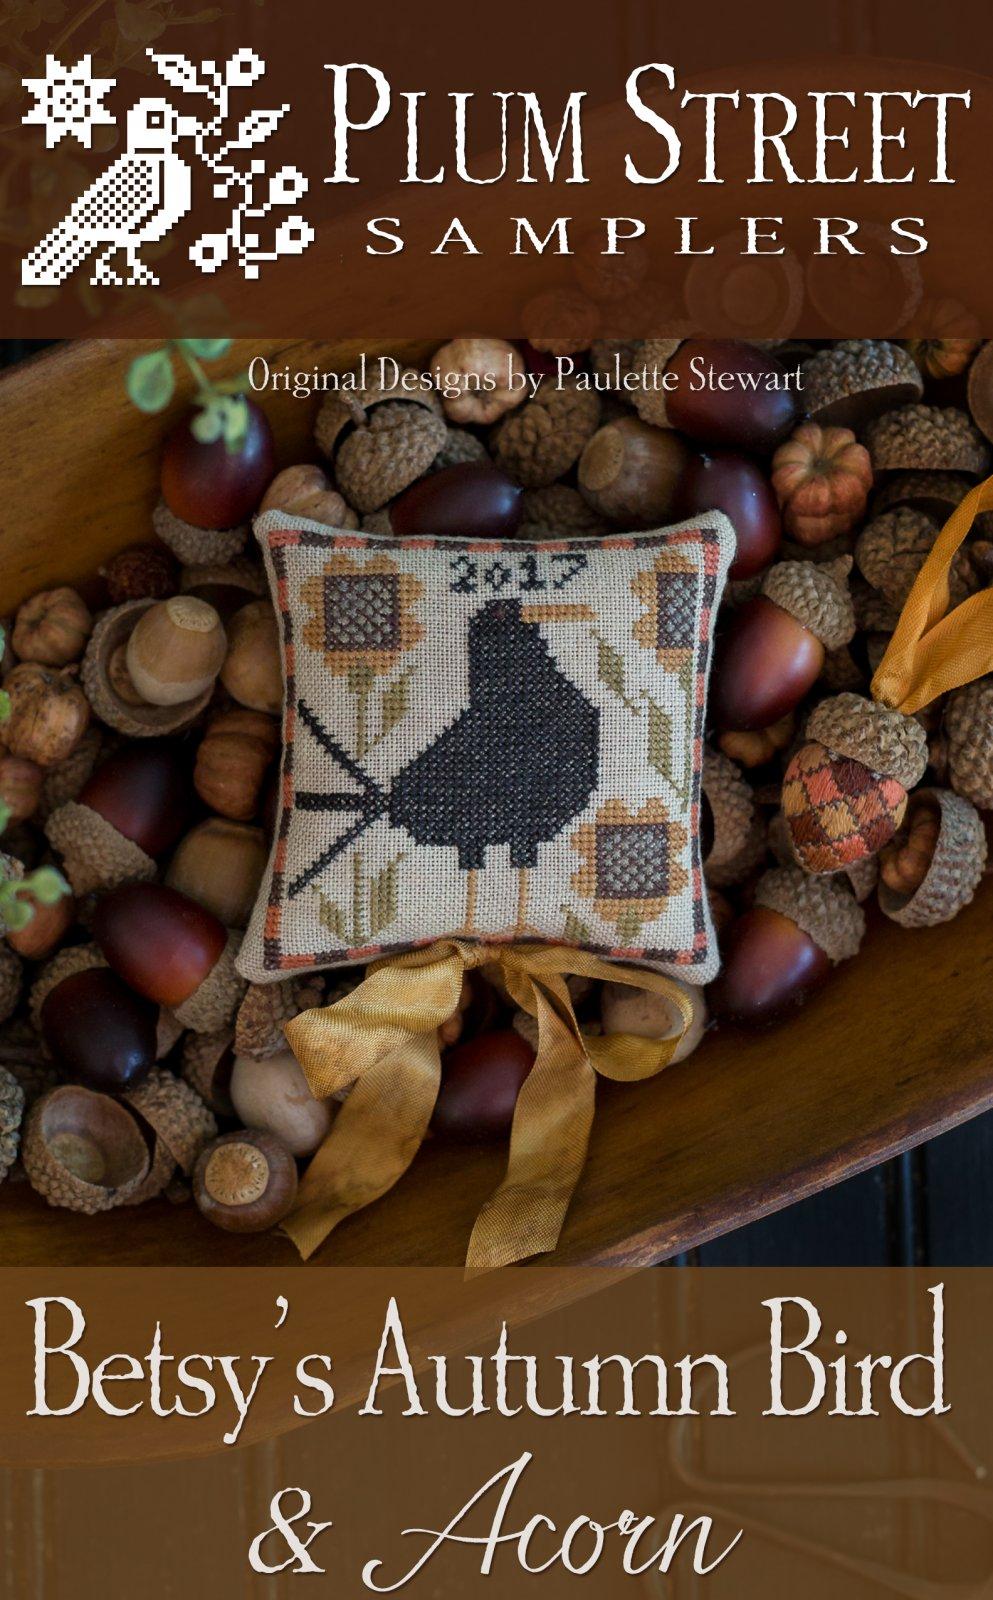 Betsy's Autumn Bird and Acorn chart - Plum Street Samp